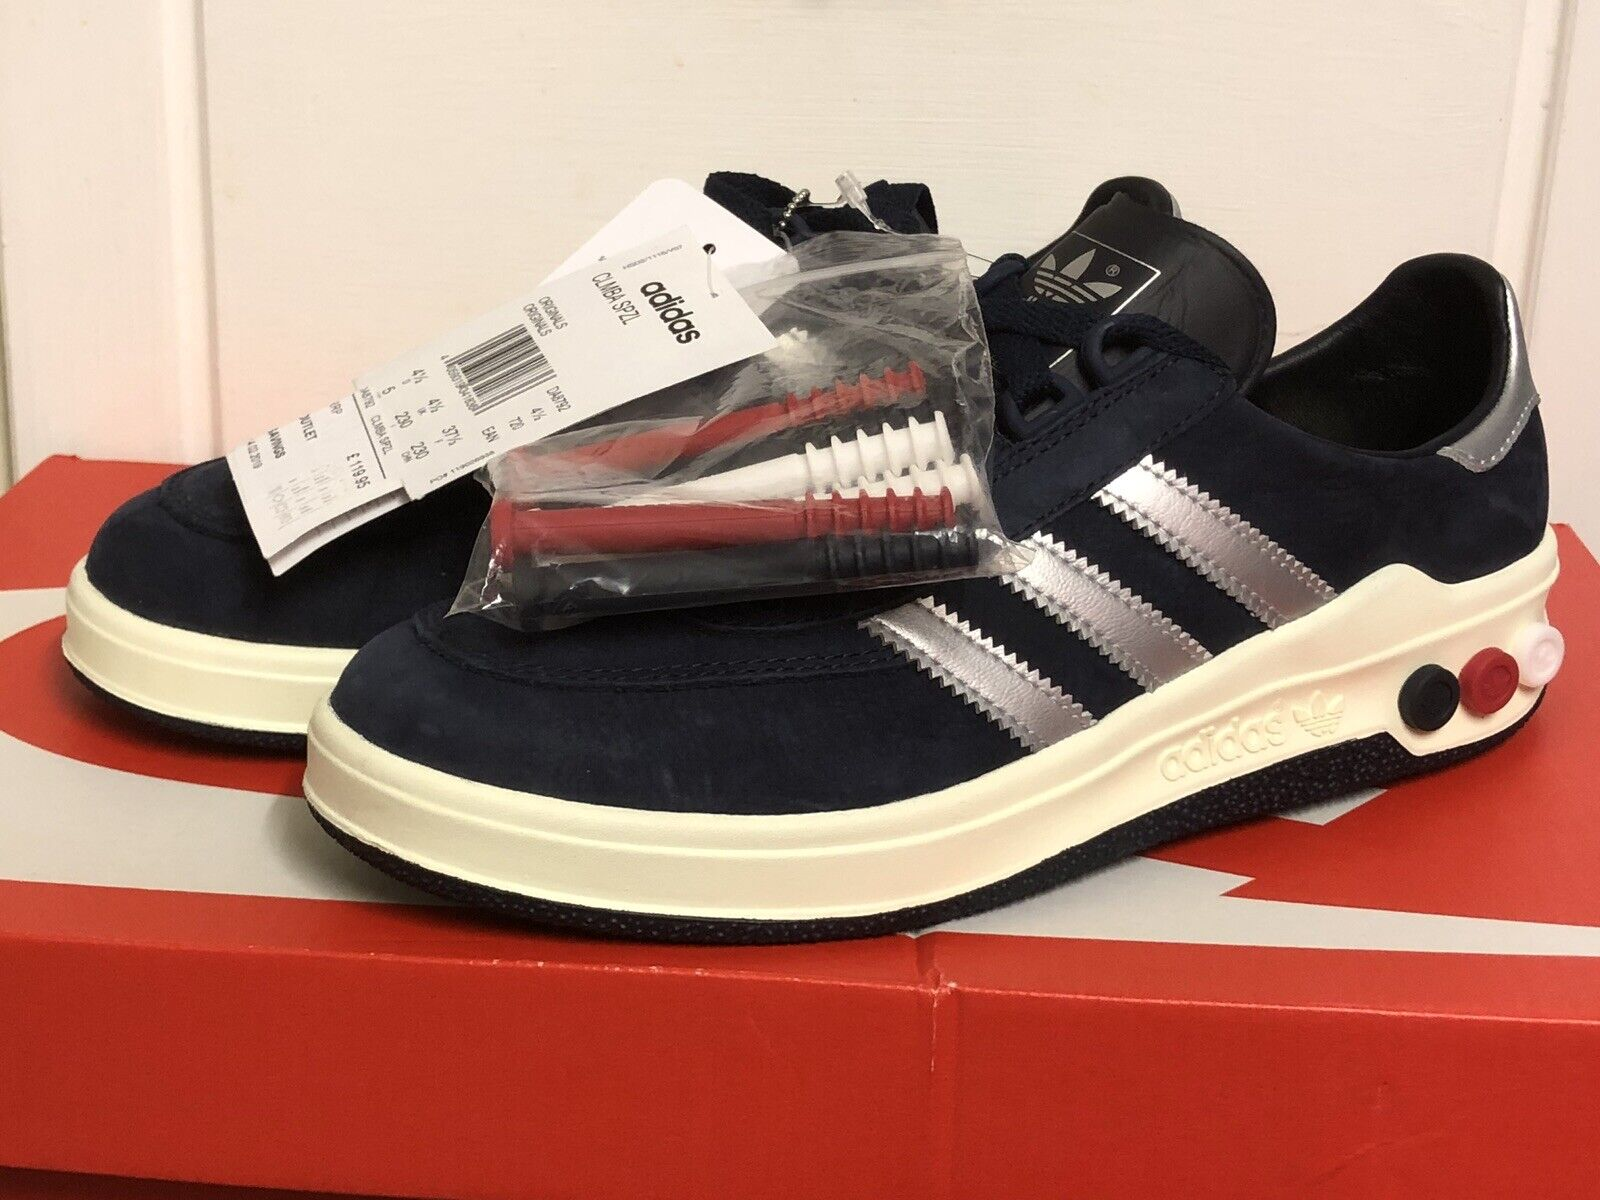 Adidas clmba spzl columbia spezial mens formatori scarpe scarpe scarpe noi 5   nuovo venuto  b65aea